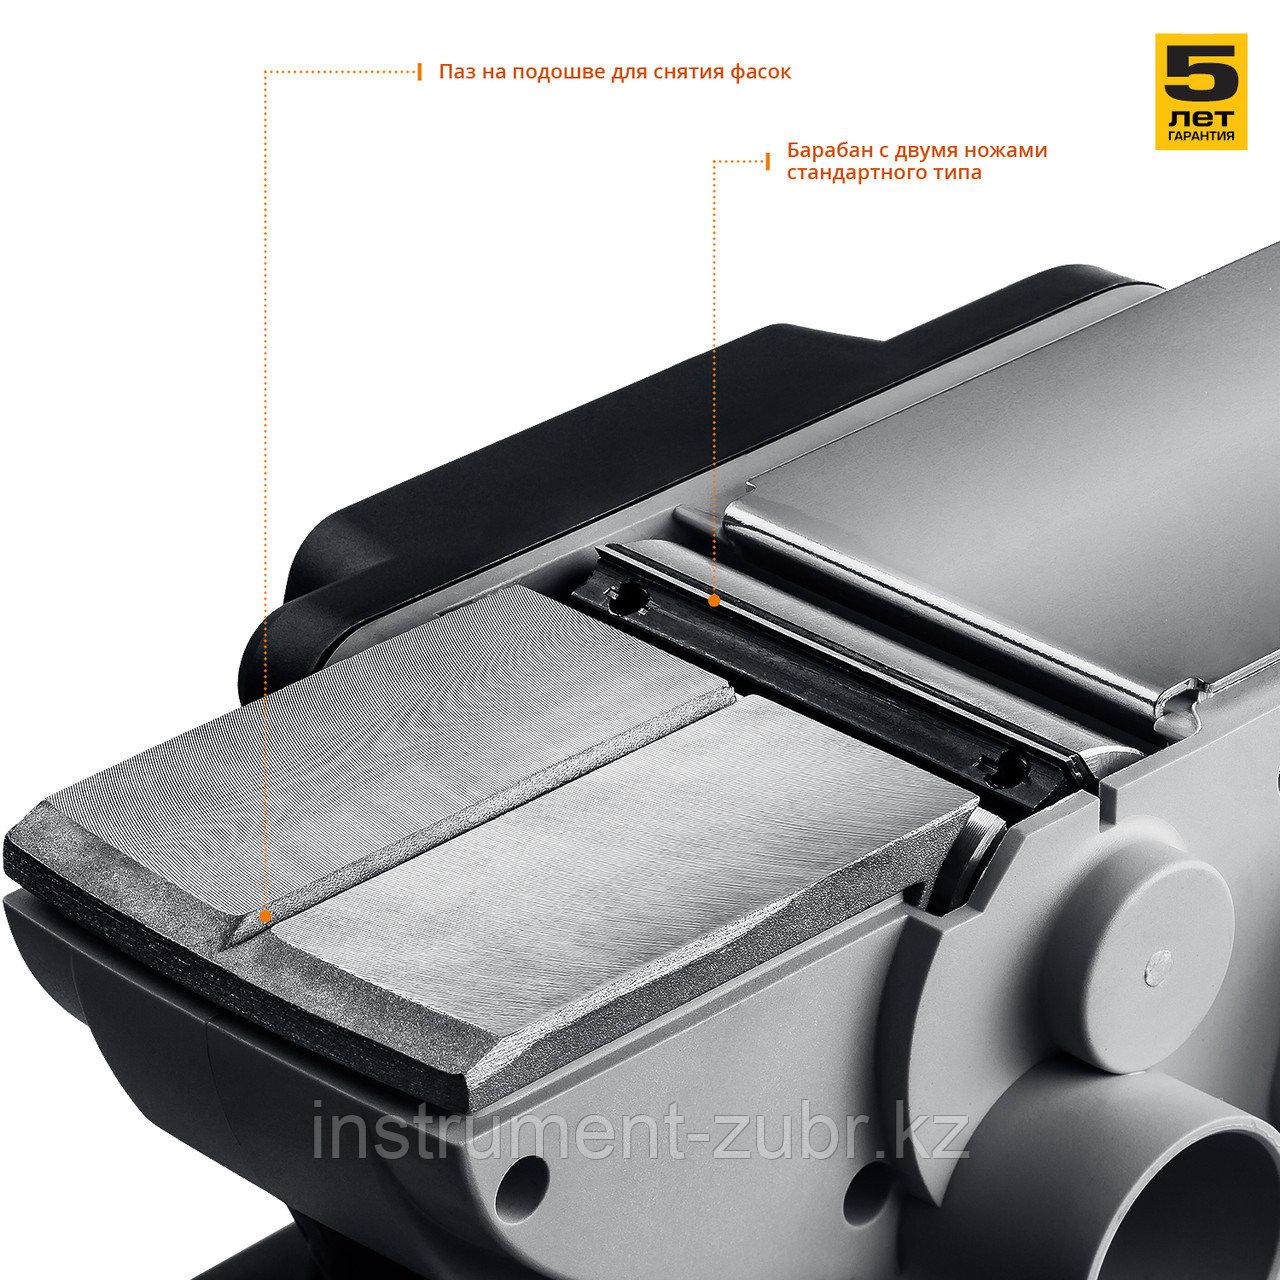 Рубанок электрический (электрорубанок), ЗУБР ЗР-750-82, глубина 2.0 мм, 82 мм, 16 000 об/мин, 750 Вт - фото 4